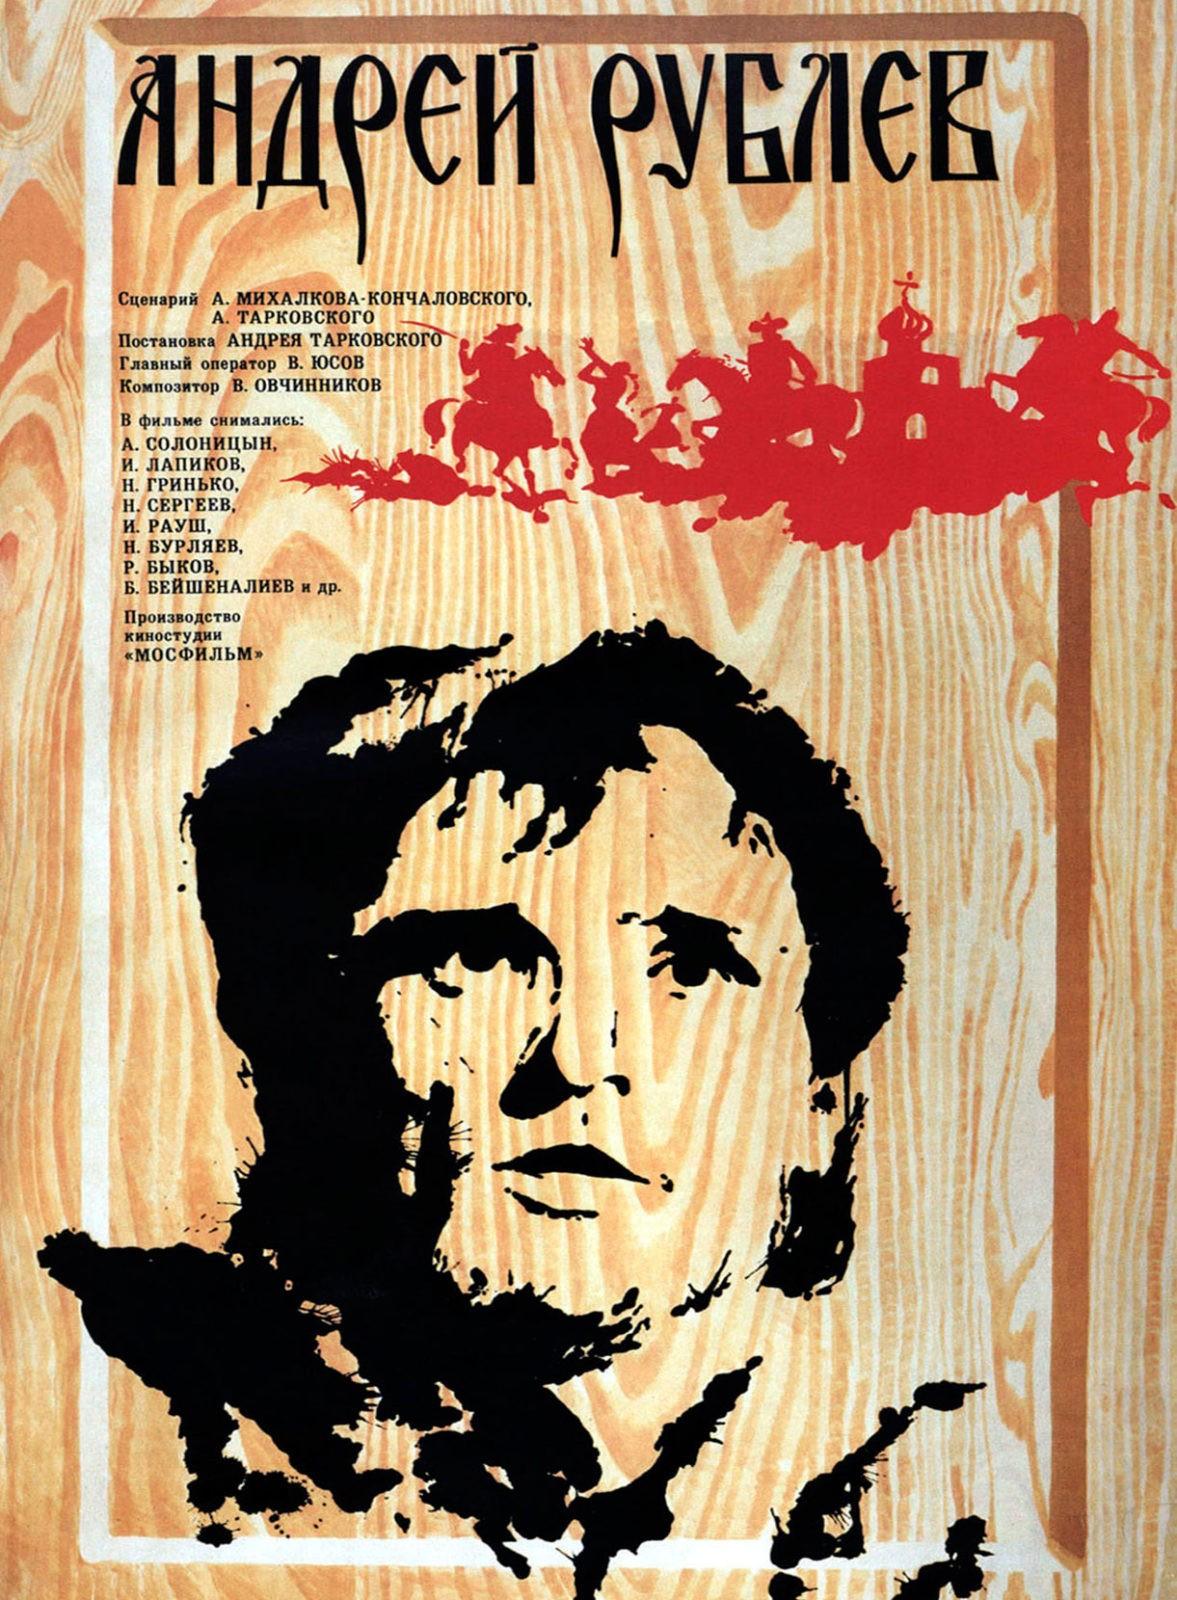 Страсти по Андрею - Андрей Рублёв плакат - постер